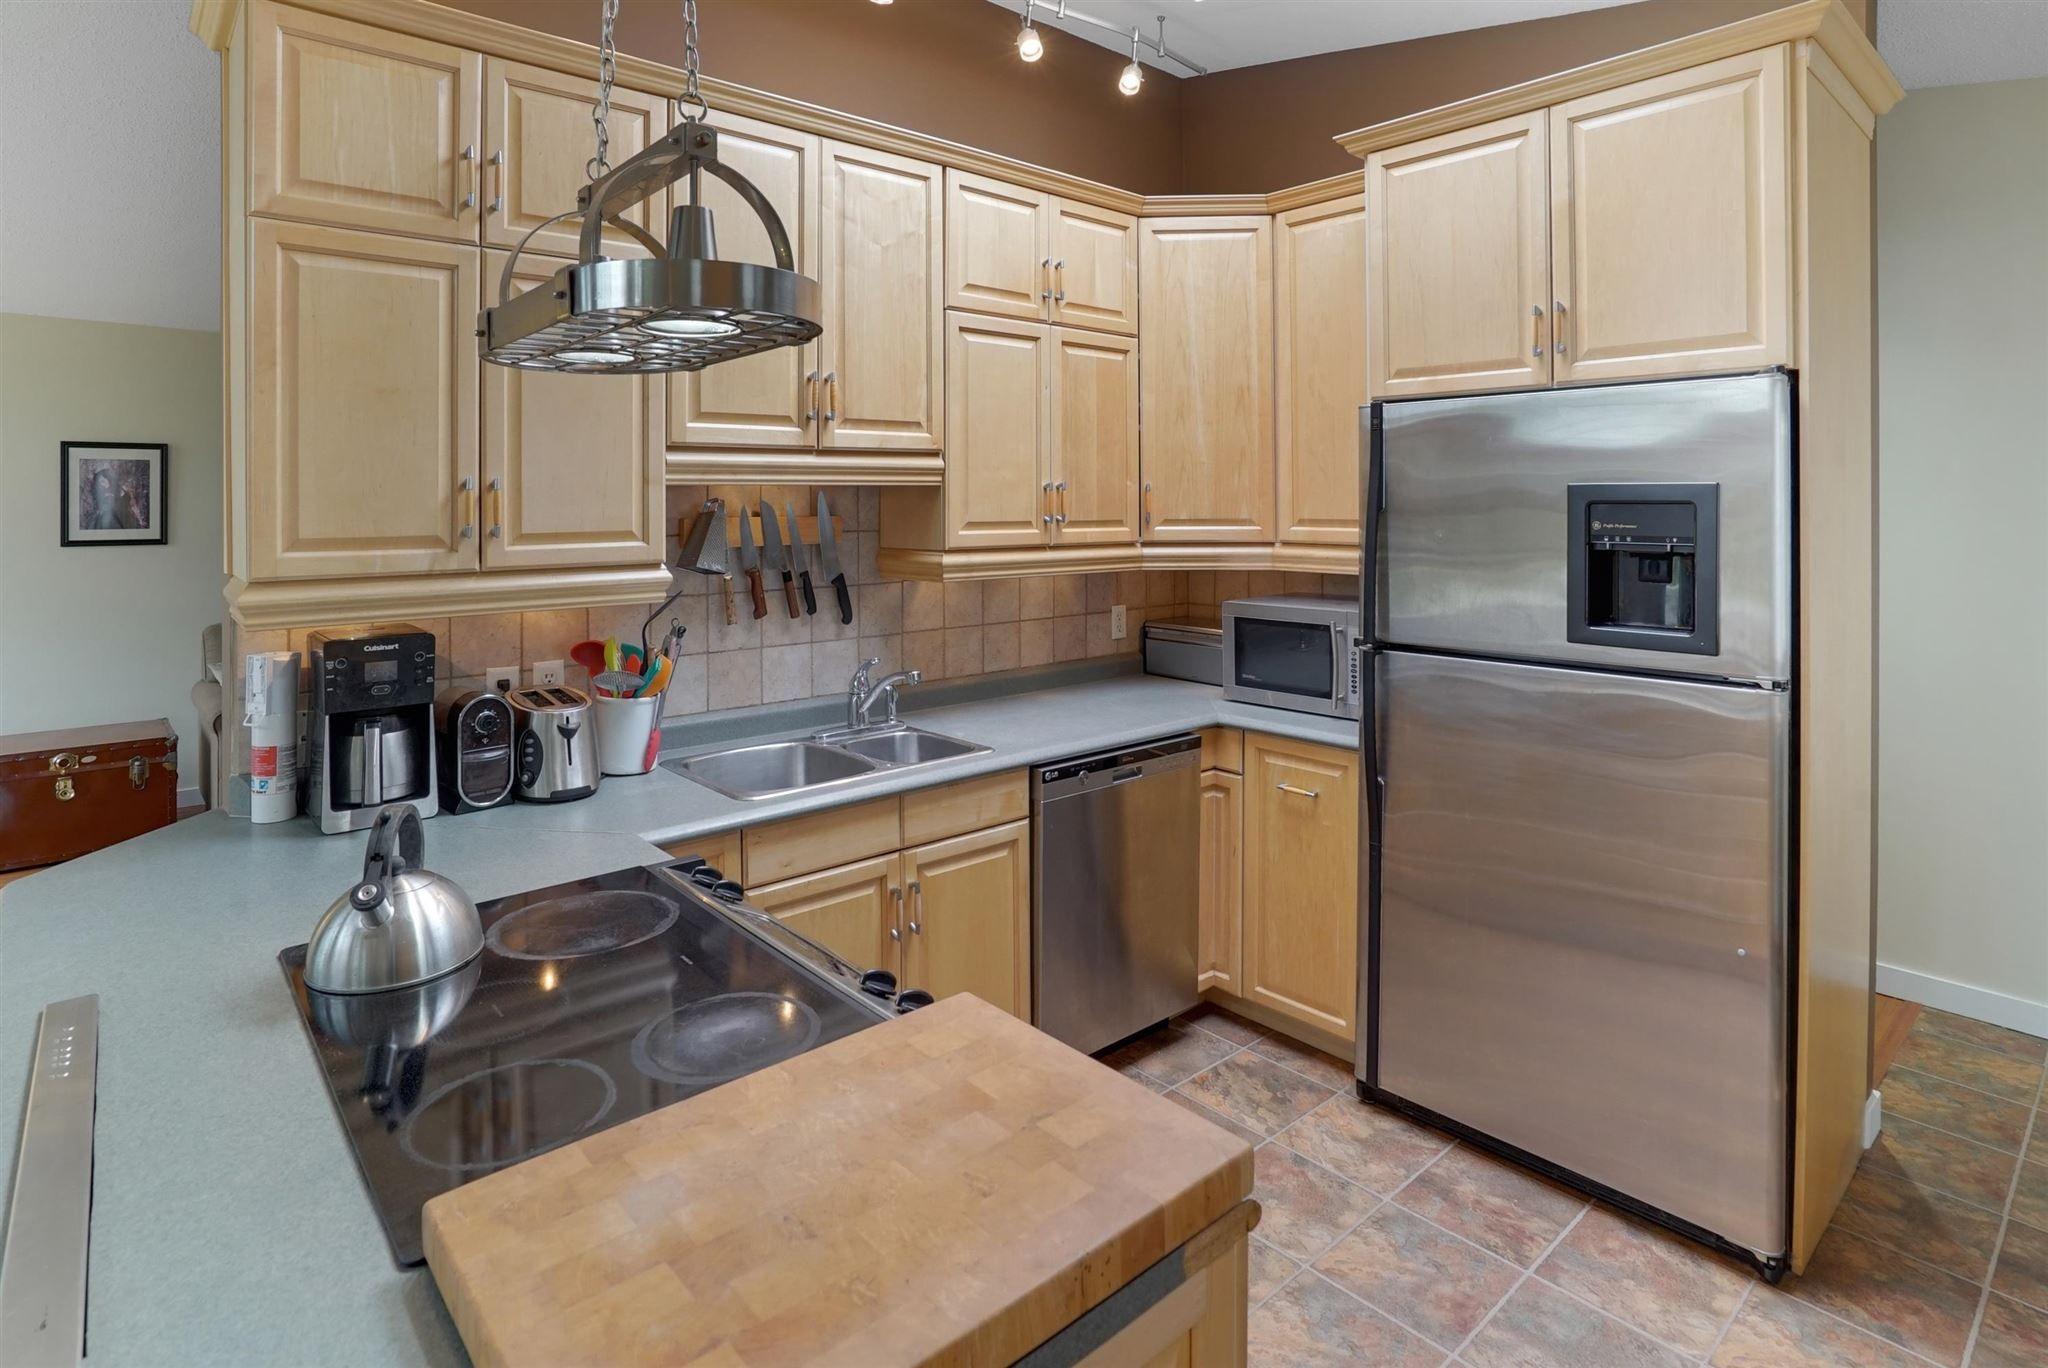 Main Photo: 11215 54 Avenue in Edmonton: Zone 15 House for sale : MLS®# E4253376